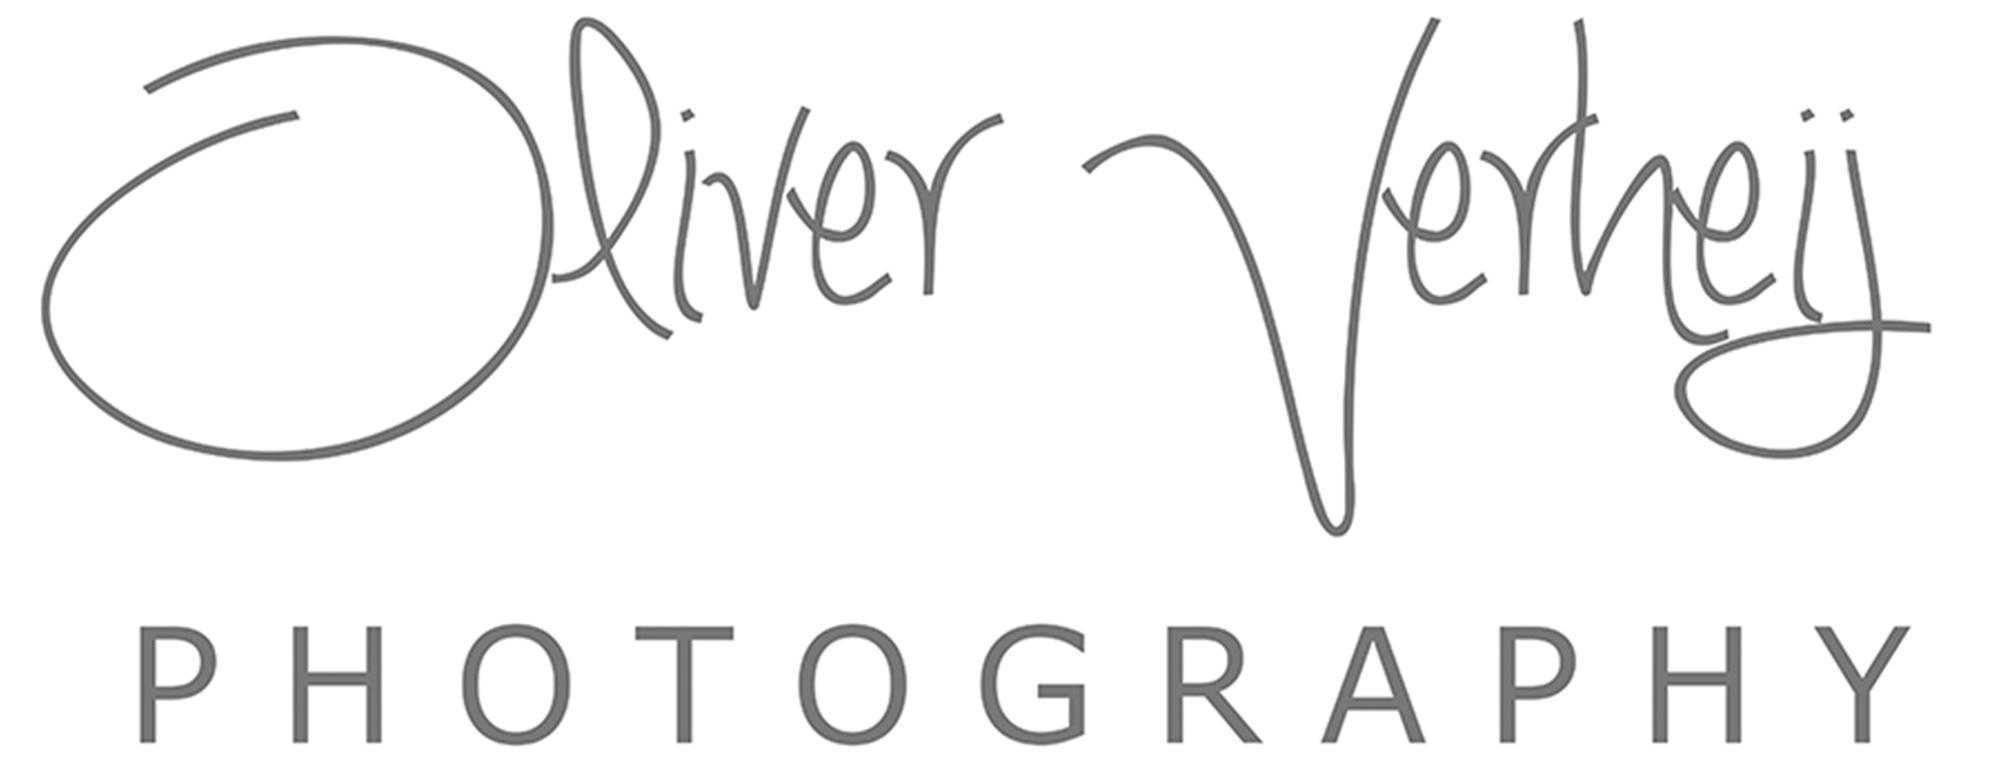 logo oliver verheij